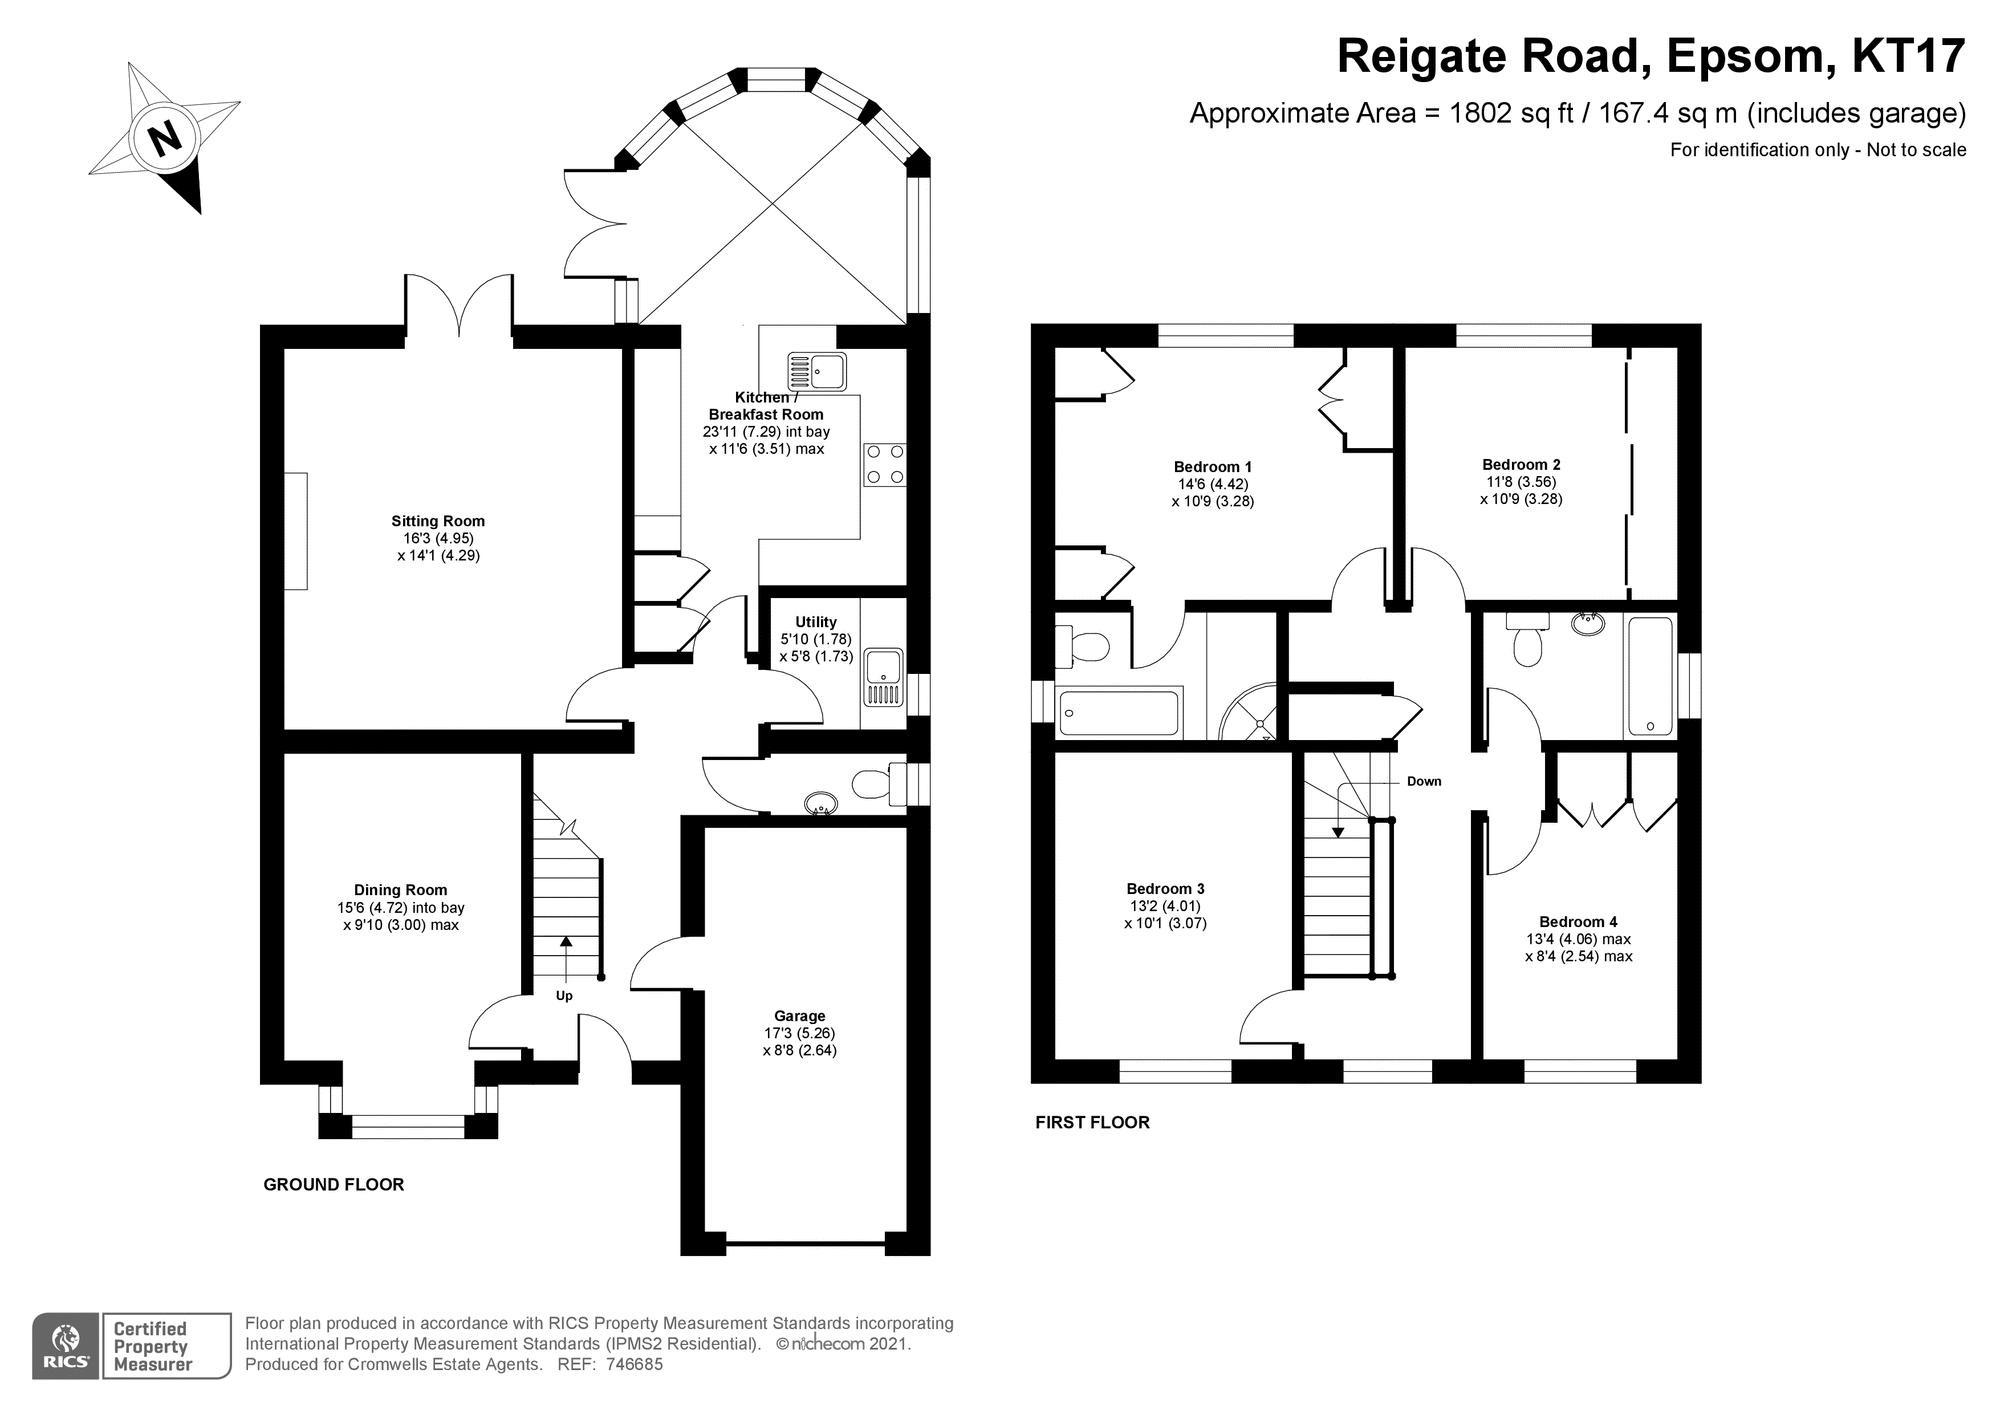 4 bedroom detached house SSTC in Epsom - floorplan 1.